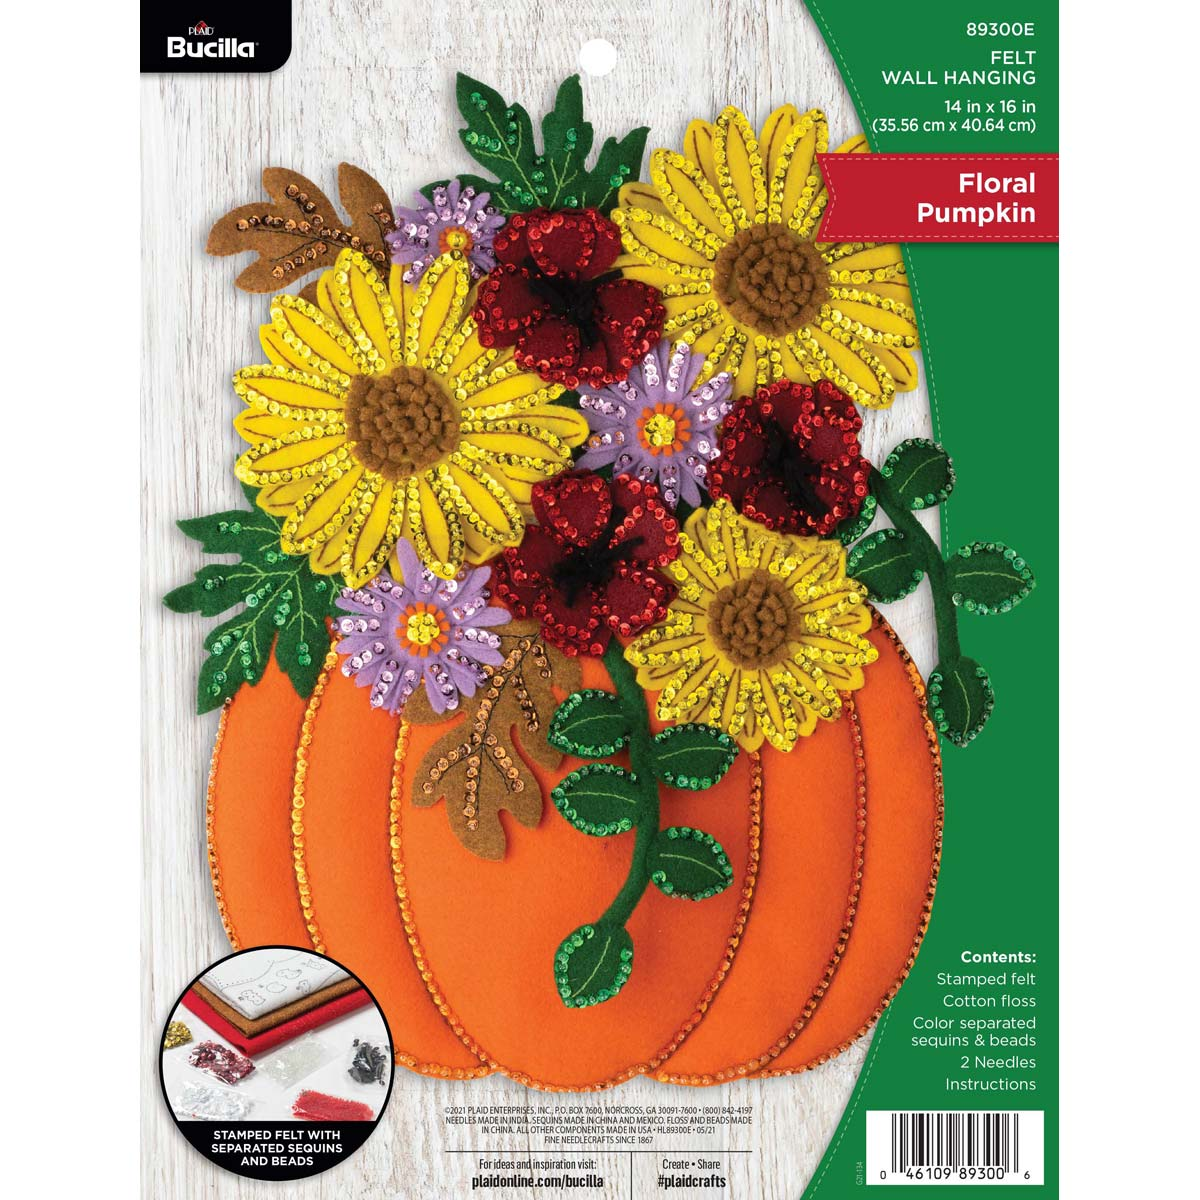 Bucilla ® Seasonal - Felt - Home Decor - Floral Pumpkin Wall Hanging - 89300E